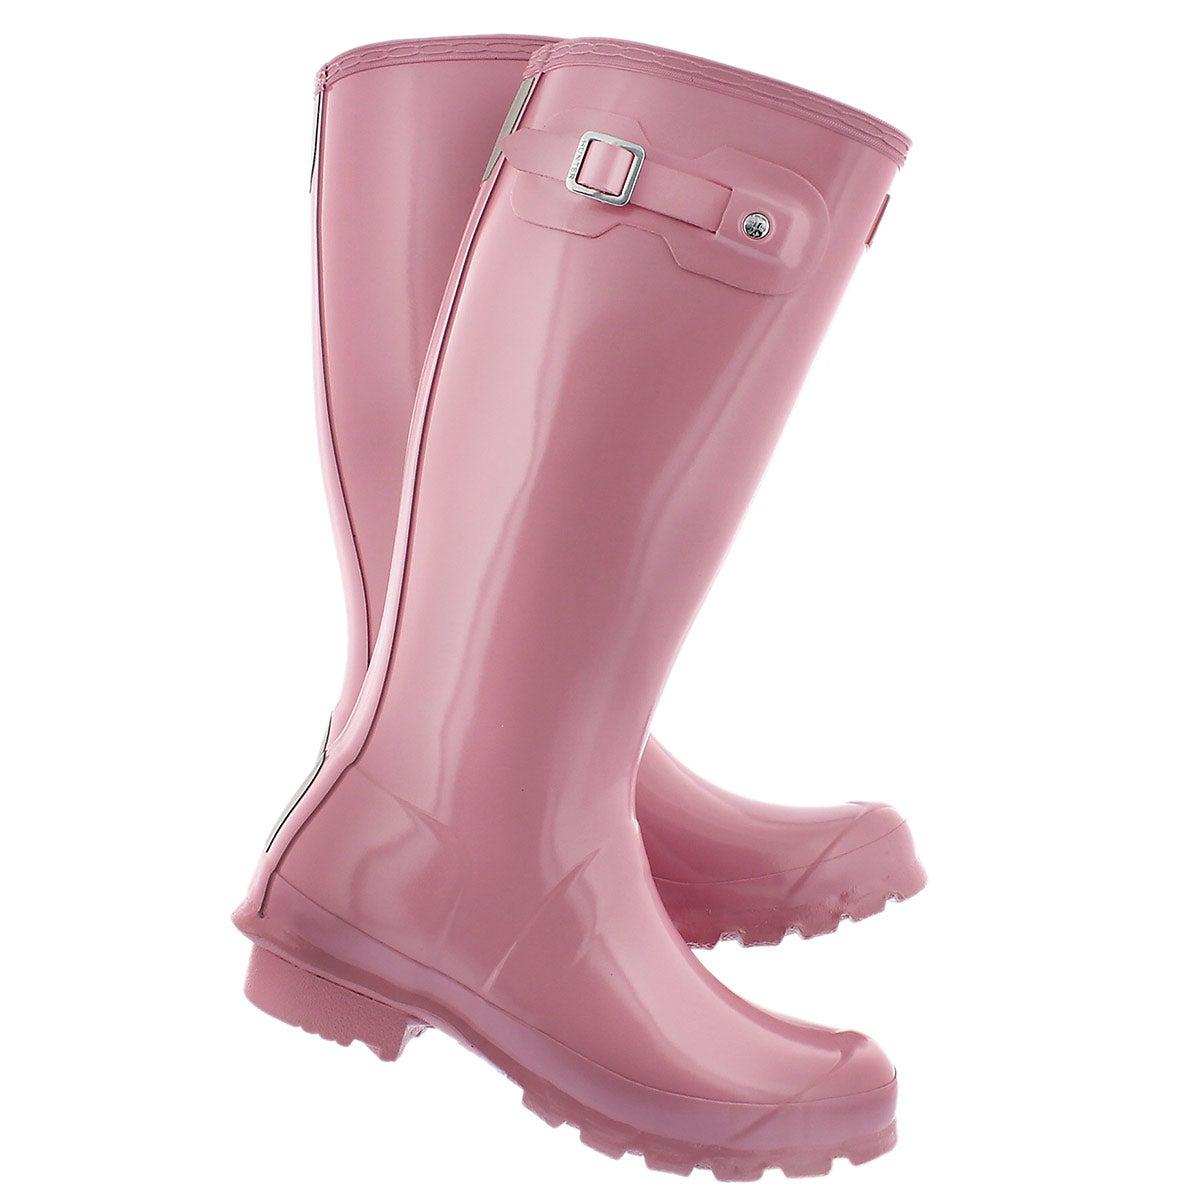 Botte de pluie Orig. Gloss, rose, filles